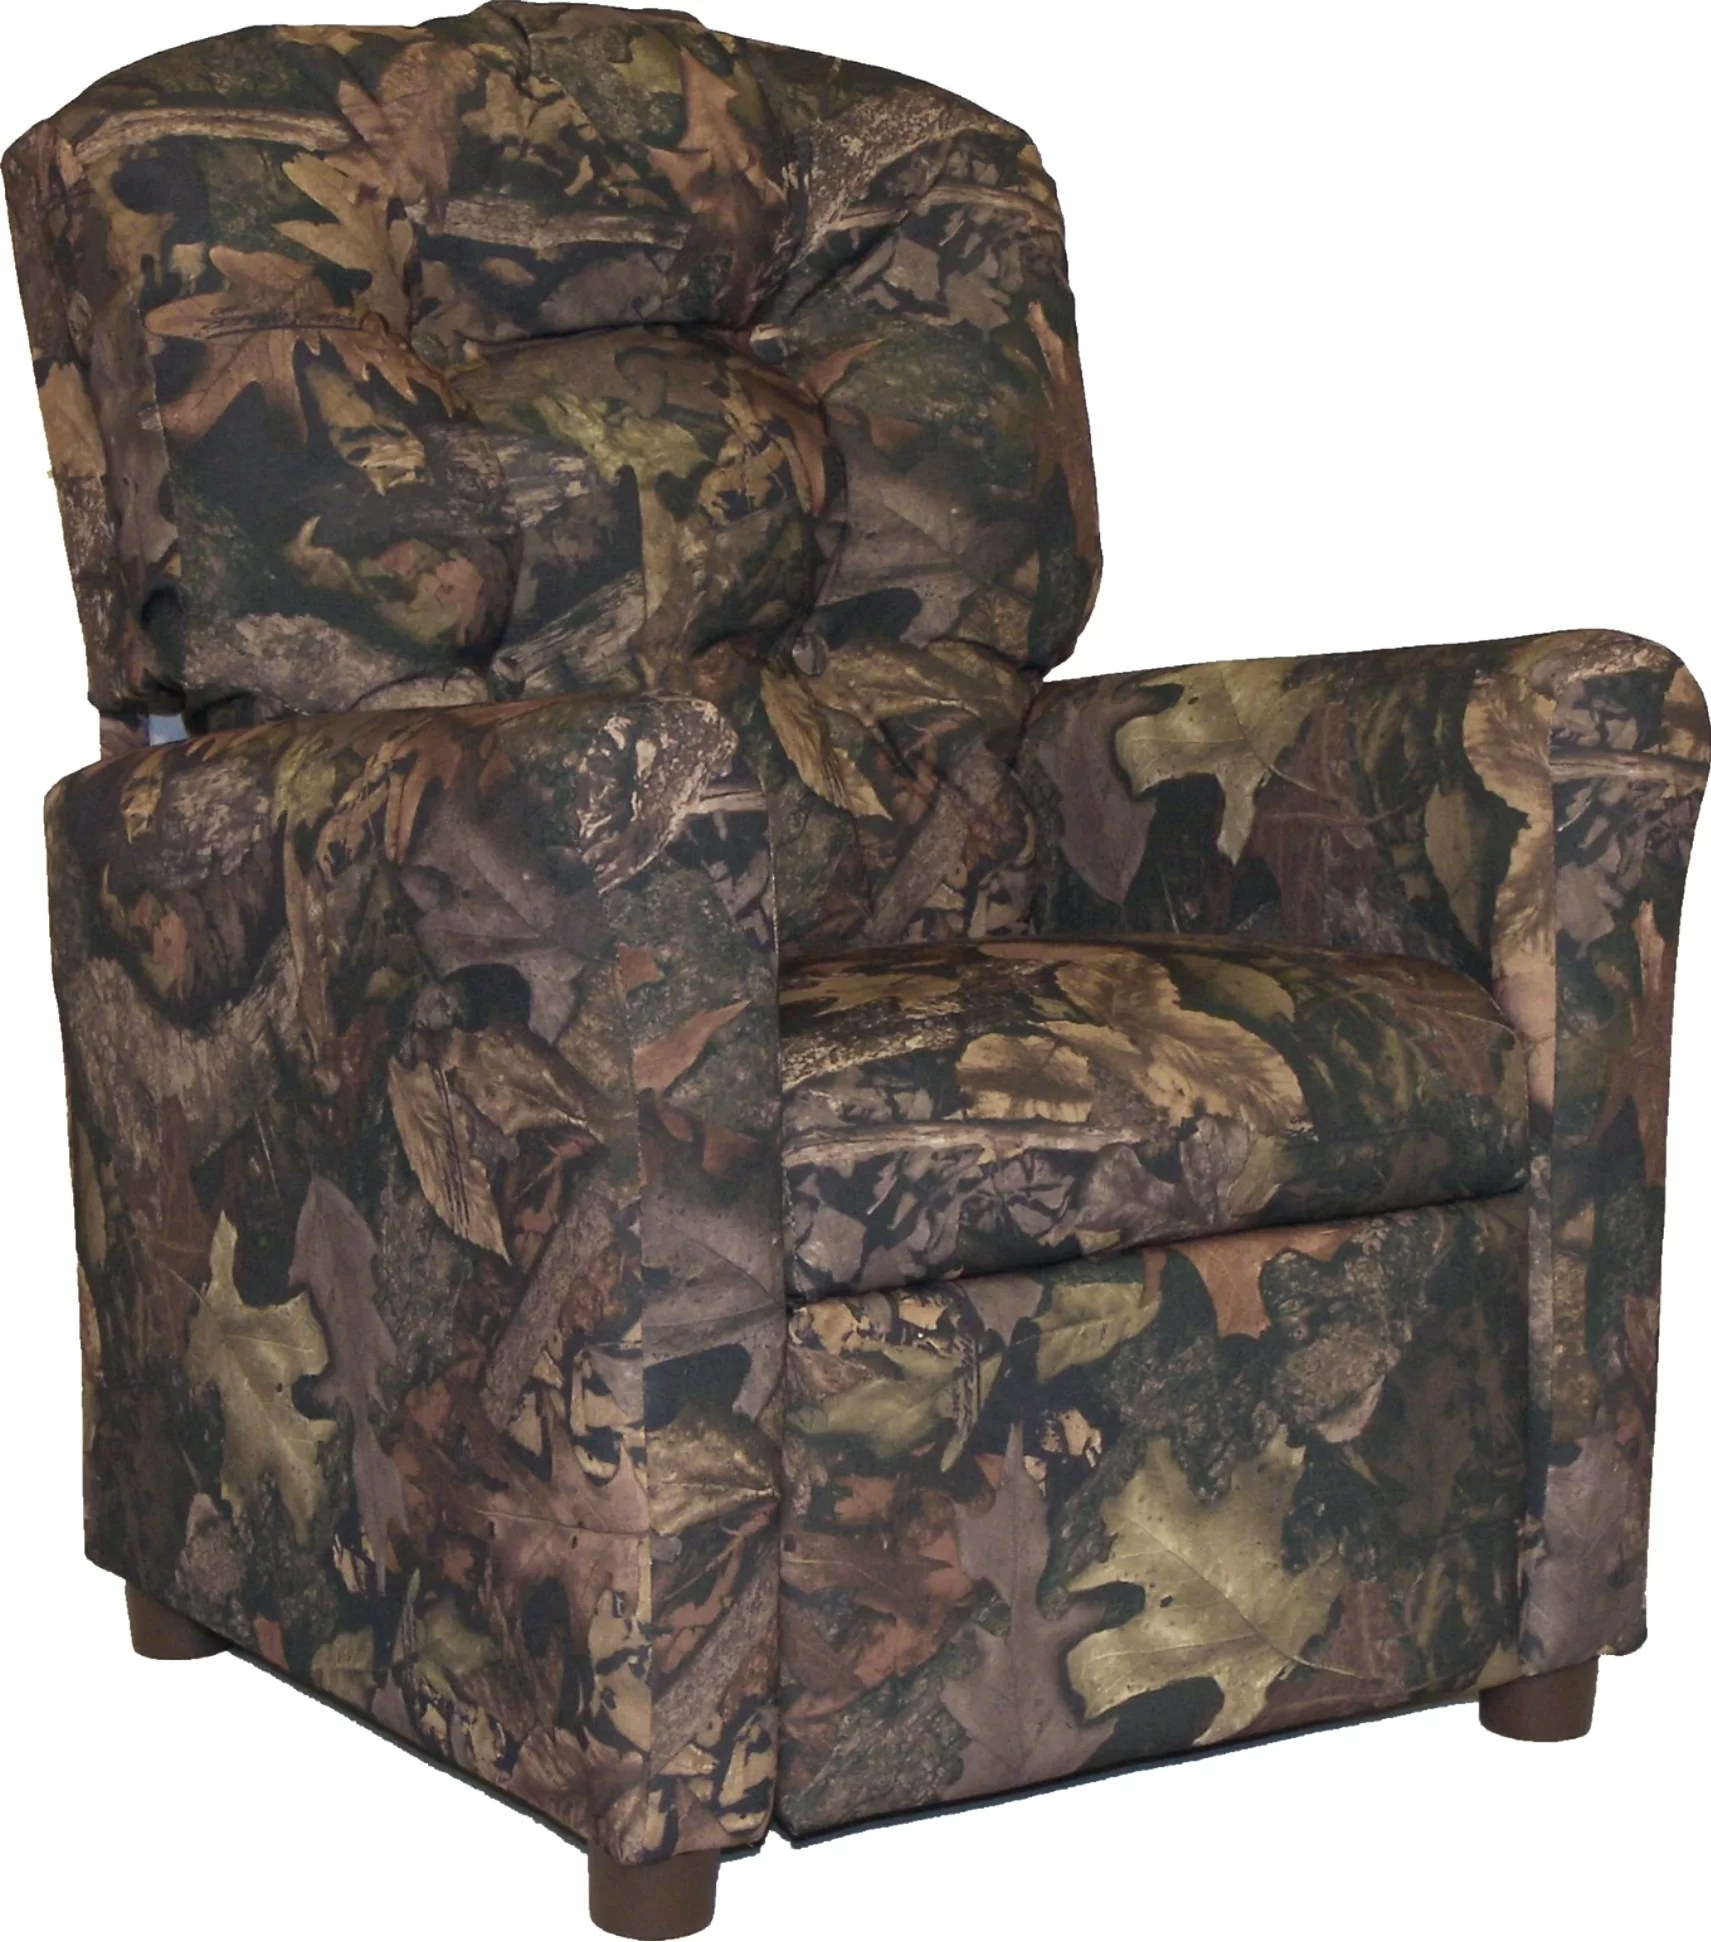 camo recliner chair narnia movies silver brazil furniture harvest kids ebay